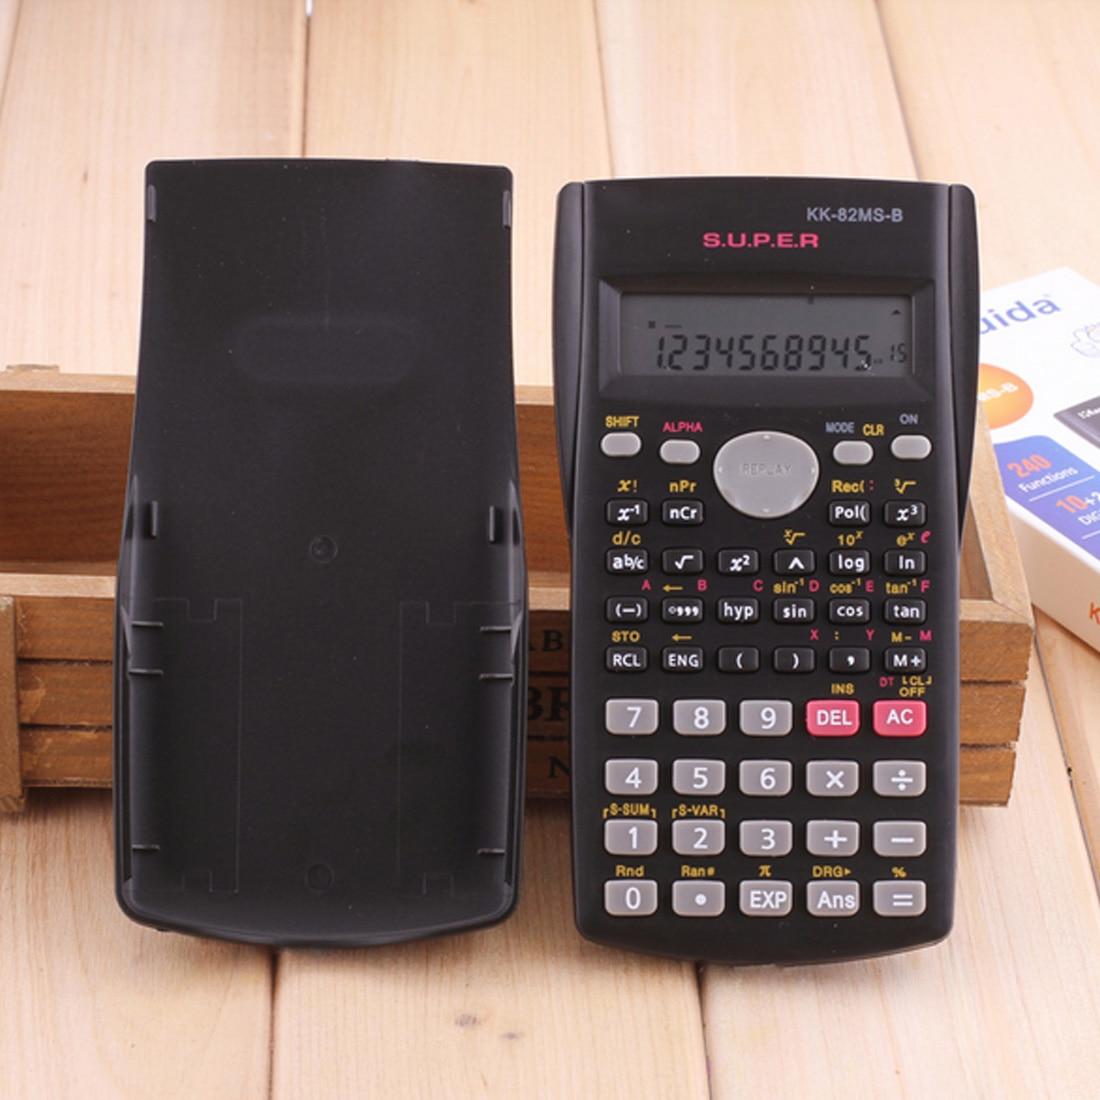 Scientific Calculator 2-Line-Display 82MS-B Multifunctional Portable Student's Handheld